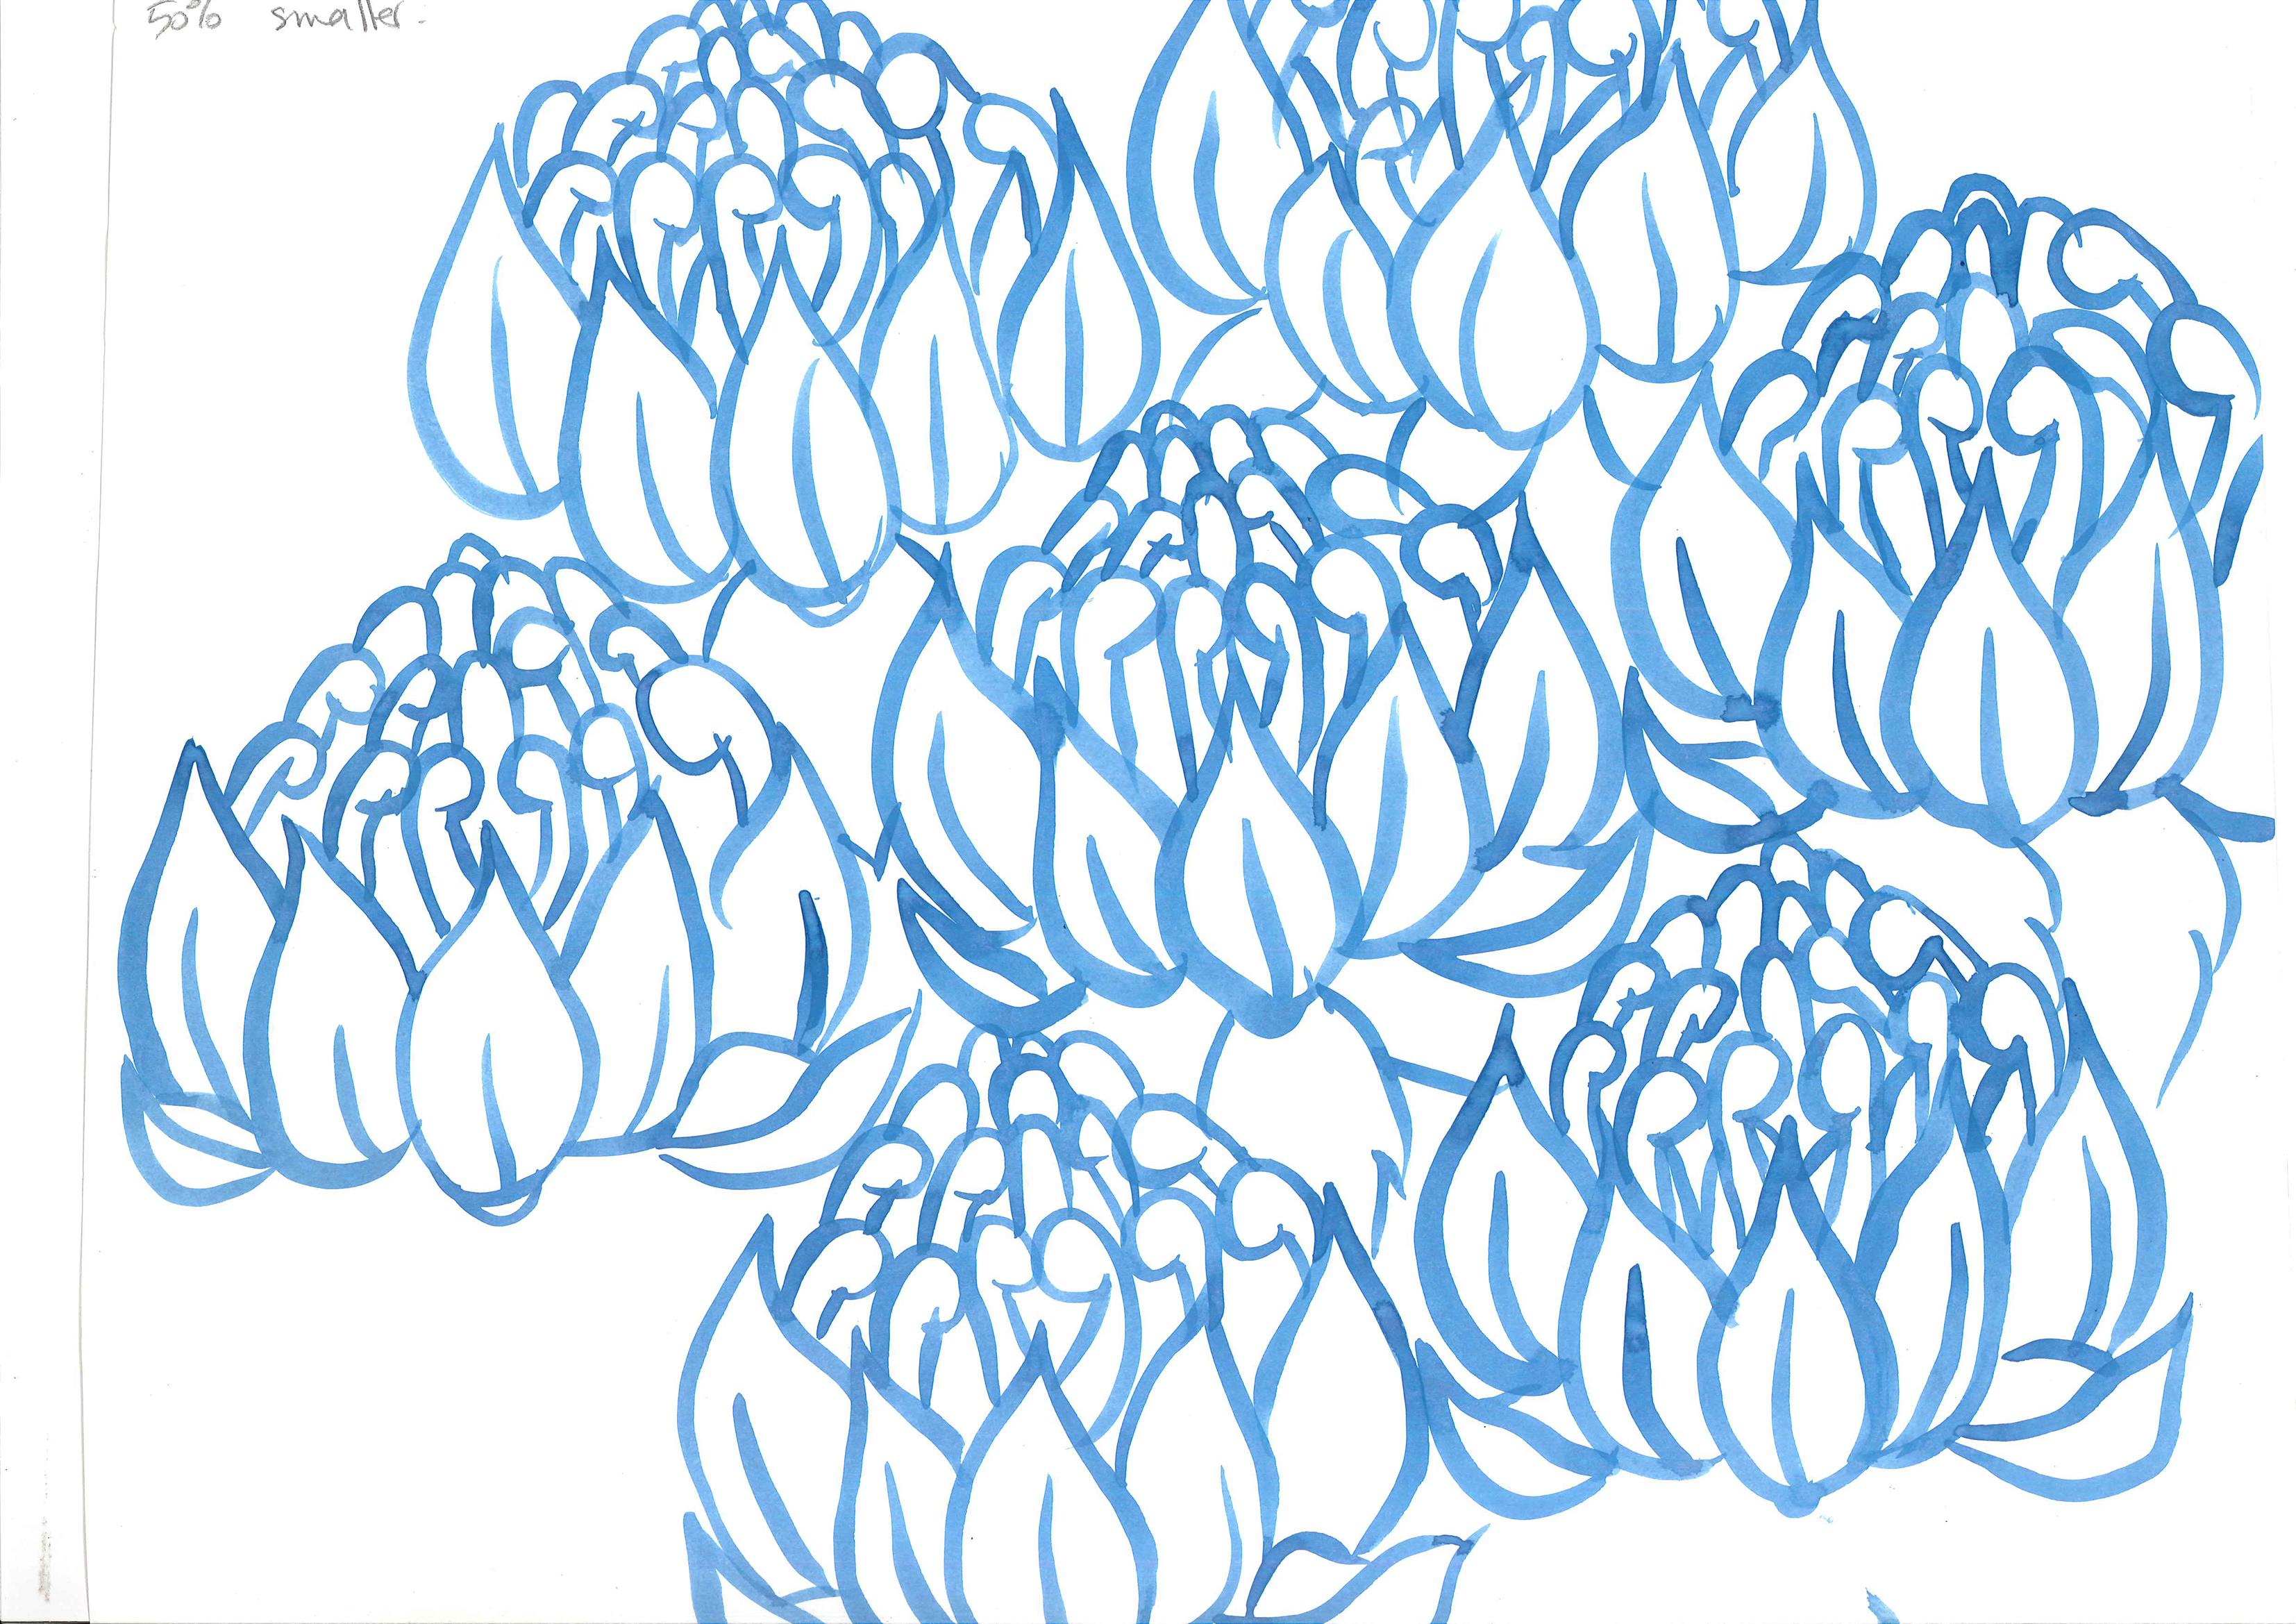 blue ink painting of repeated waratah motif. Handwriting reads: 50% smaller